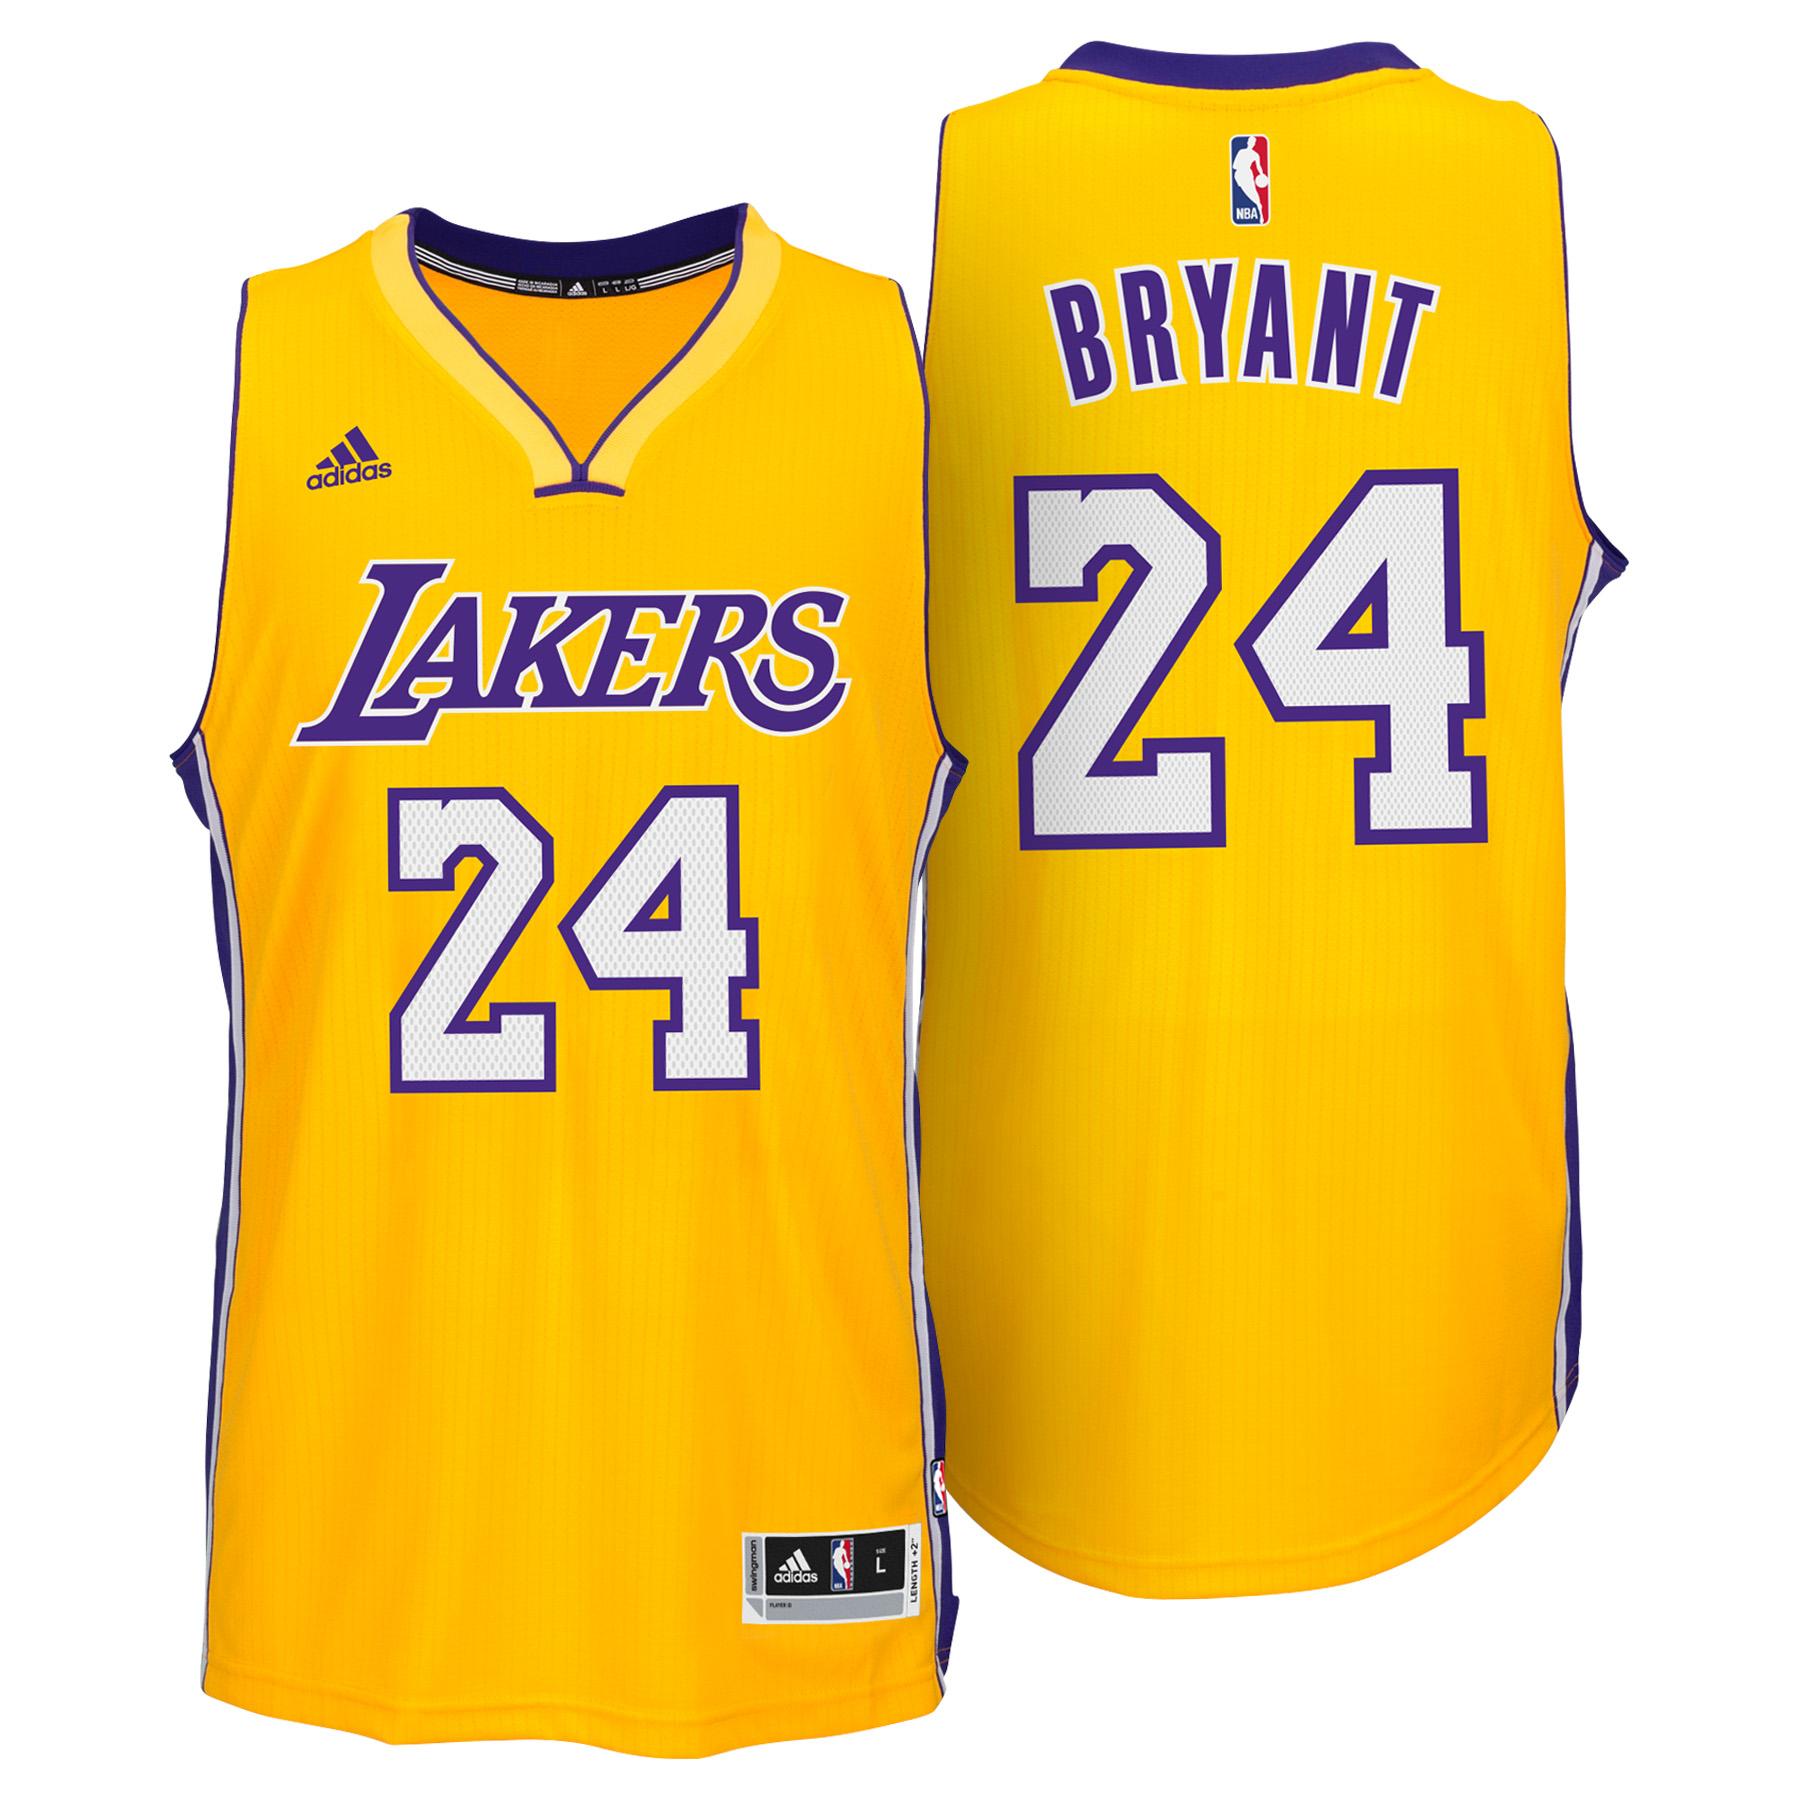 Los Angeles Lakers Home Swingman Jersey - Kobe Bryant - Mens